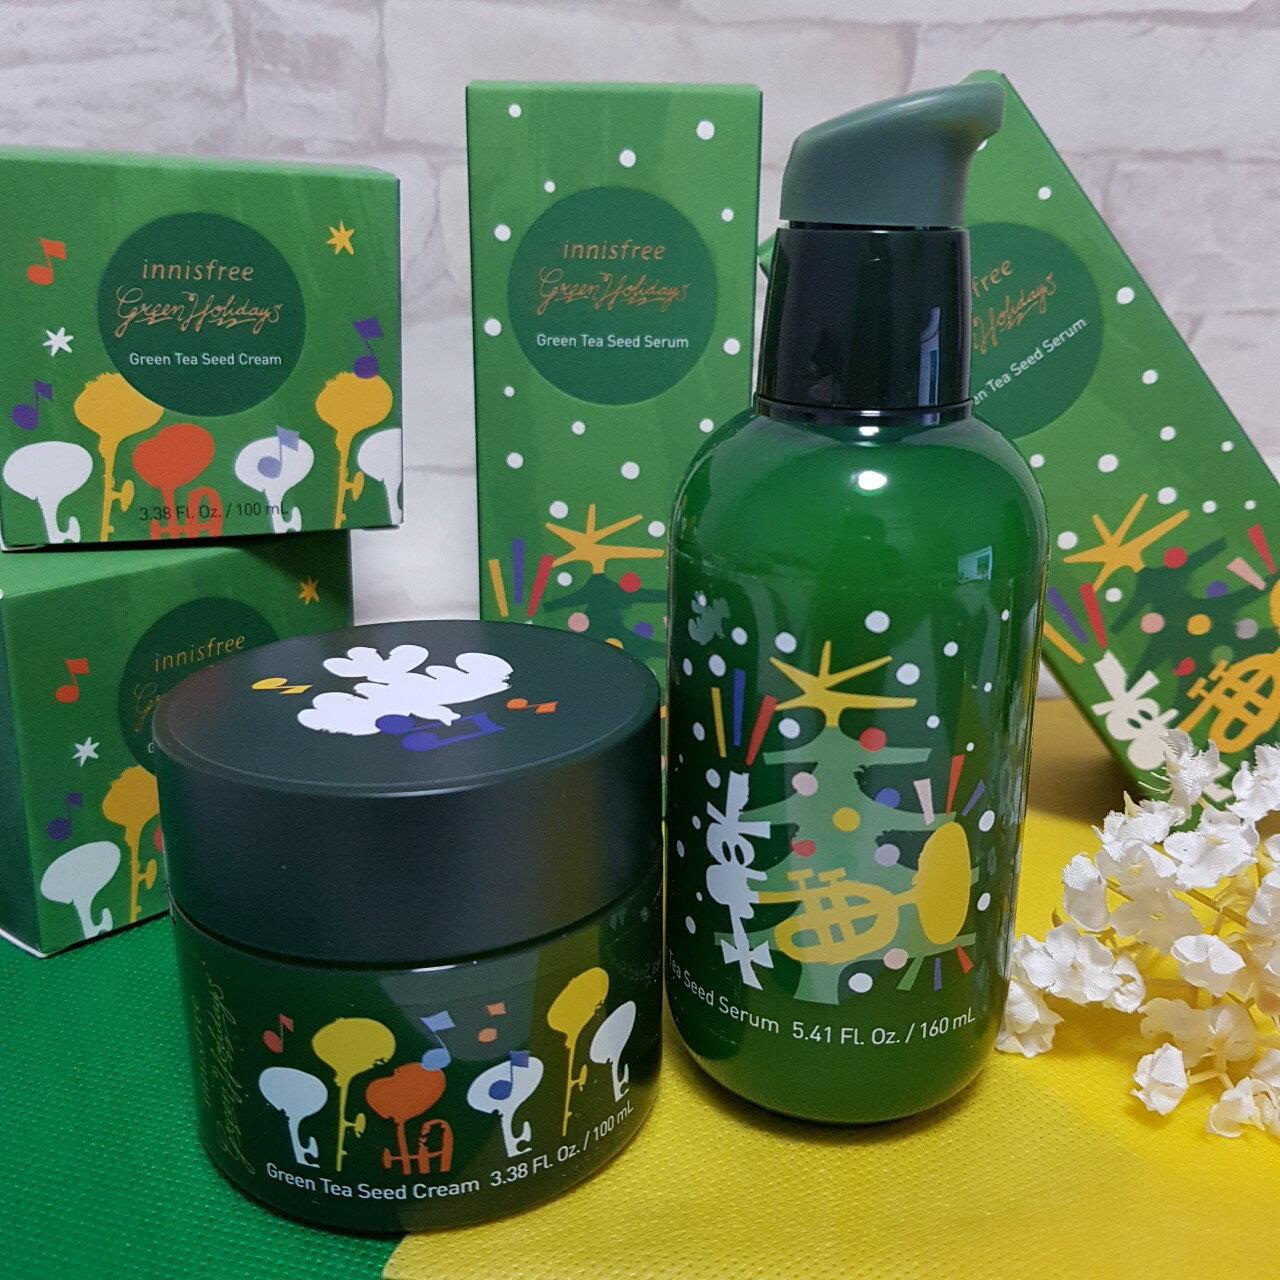 innisfree 2019 綠色聖誕 綠茶籽保濕系列 2